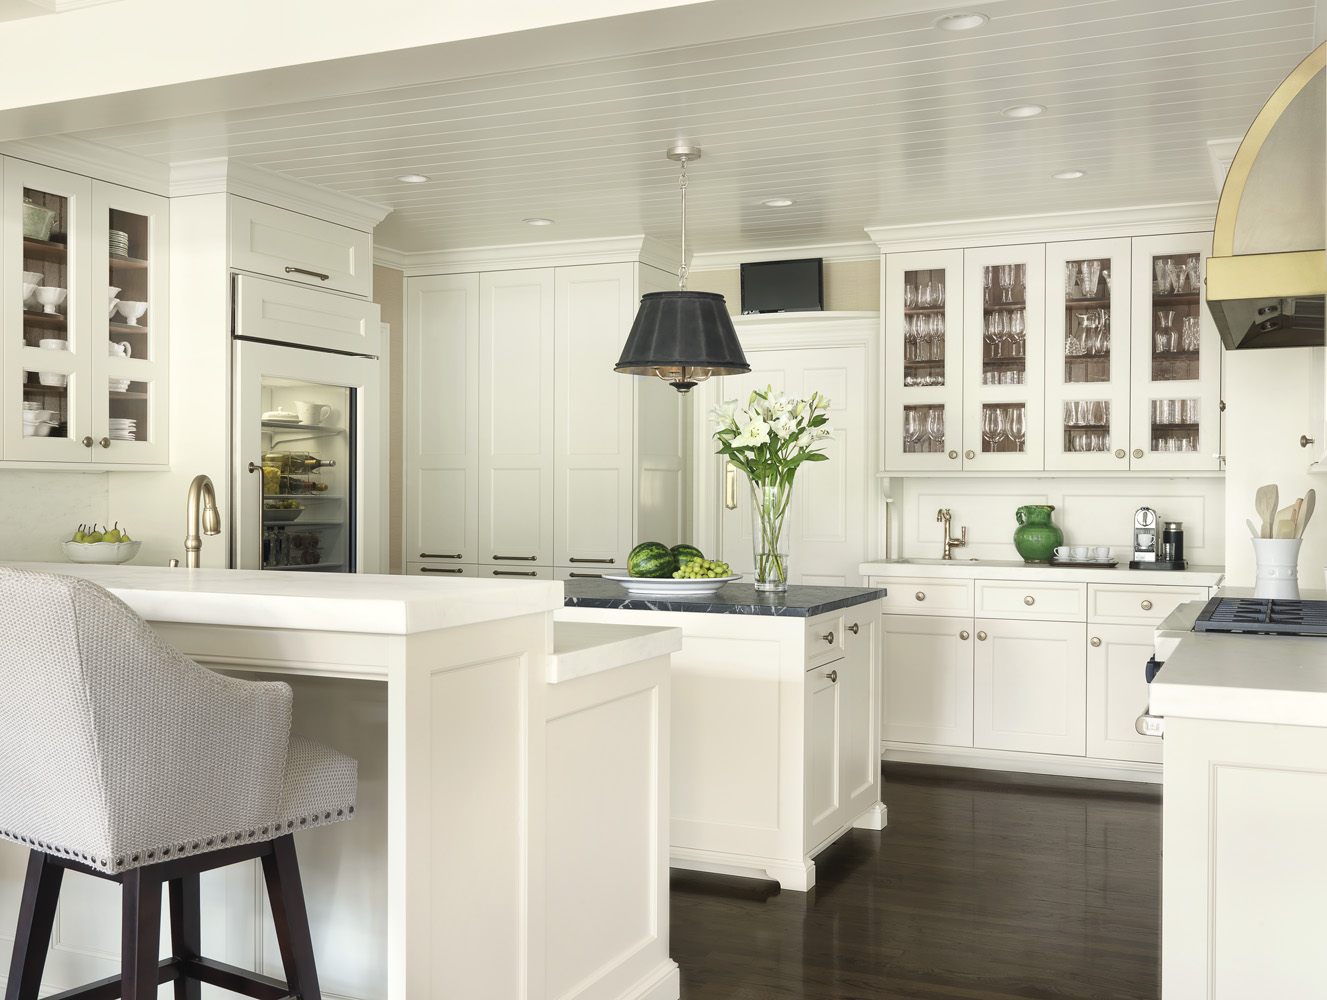 kitchen v2 revised.jpg